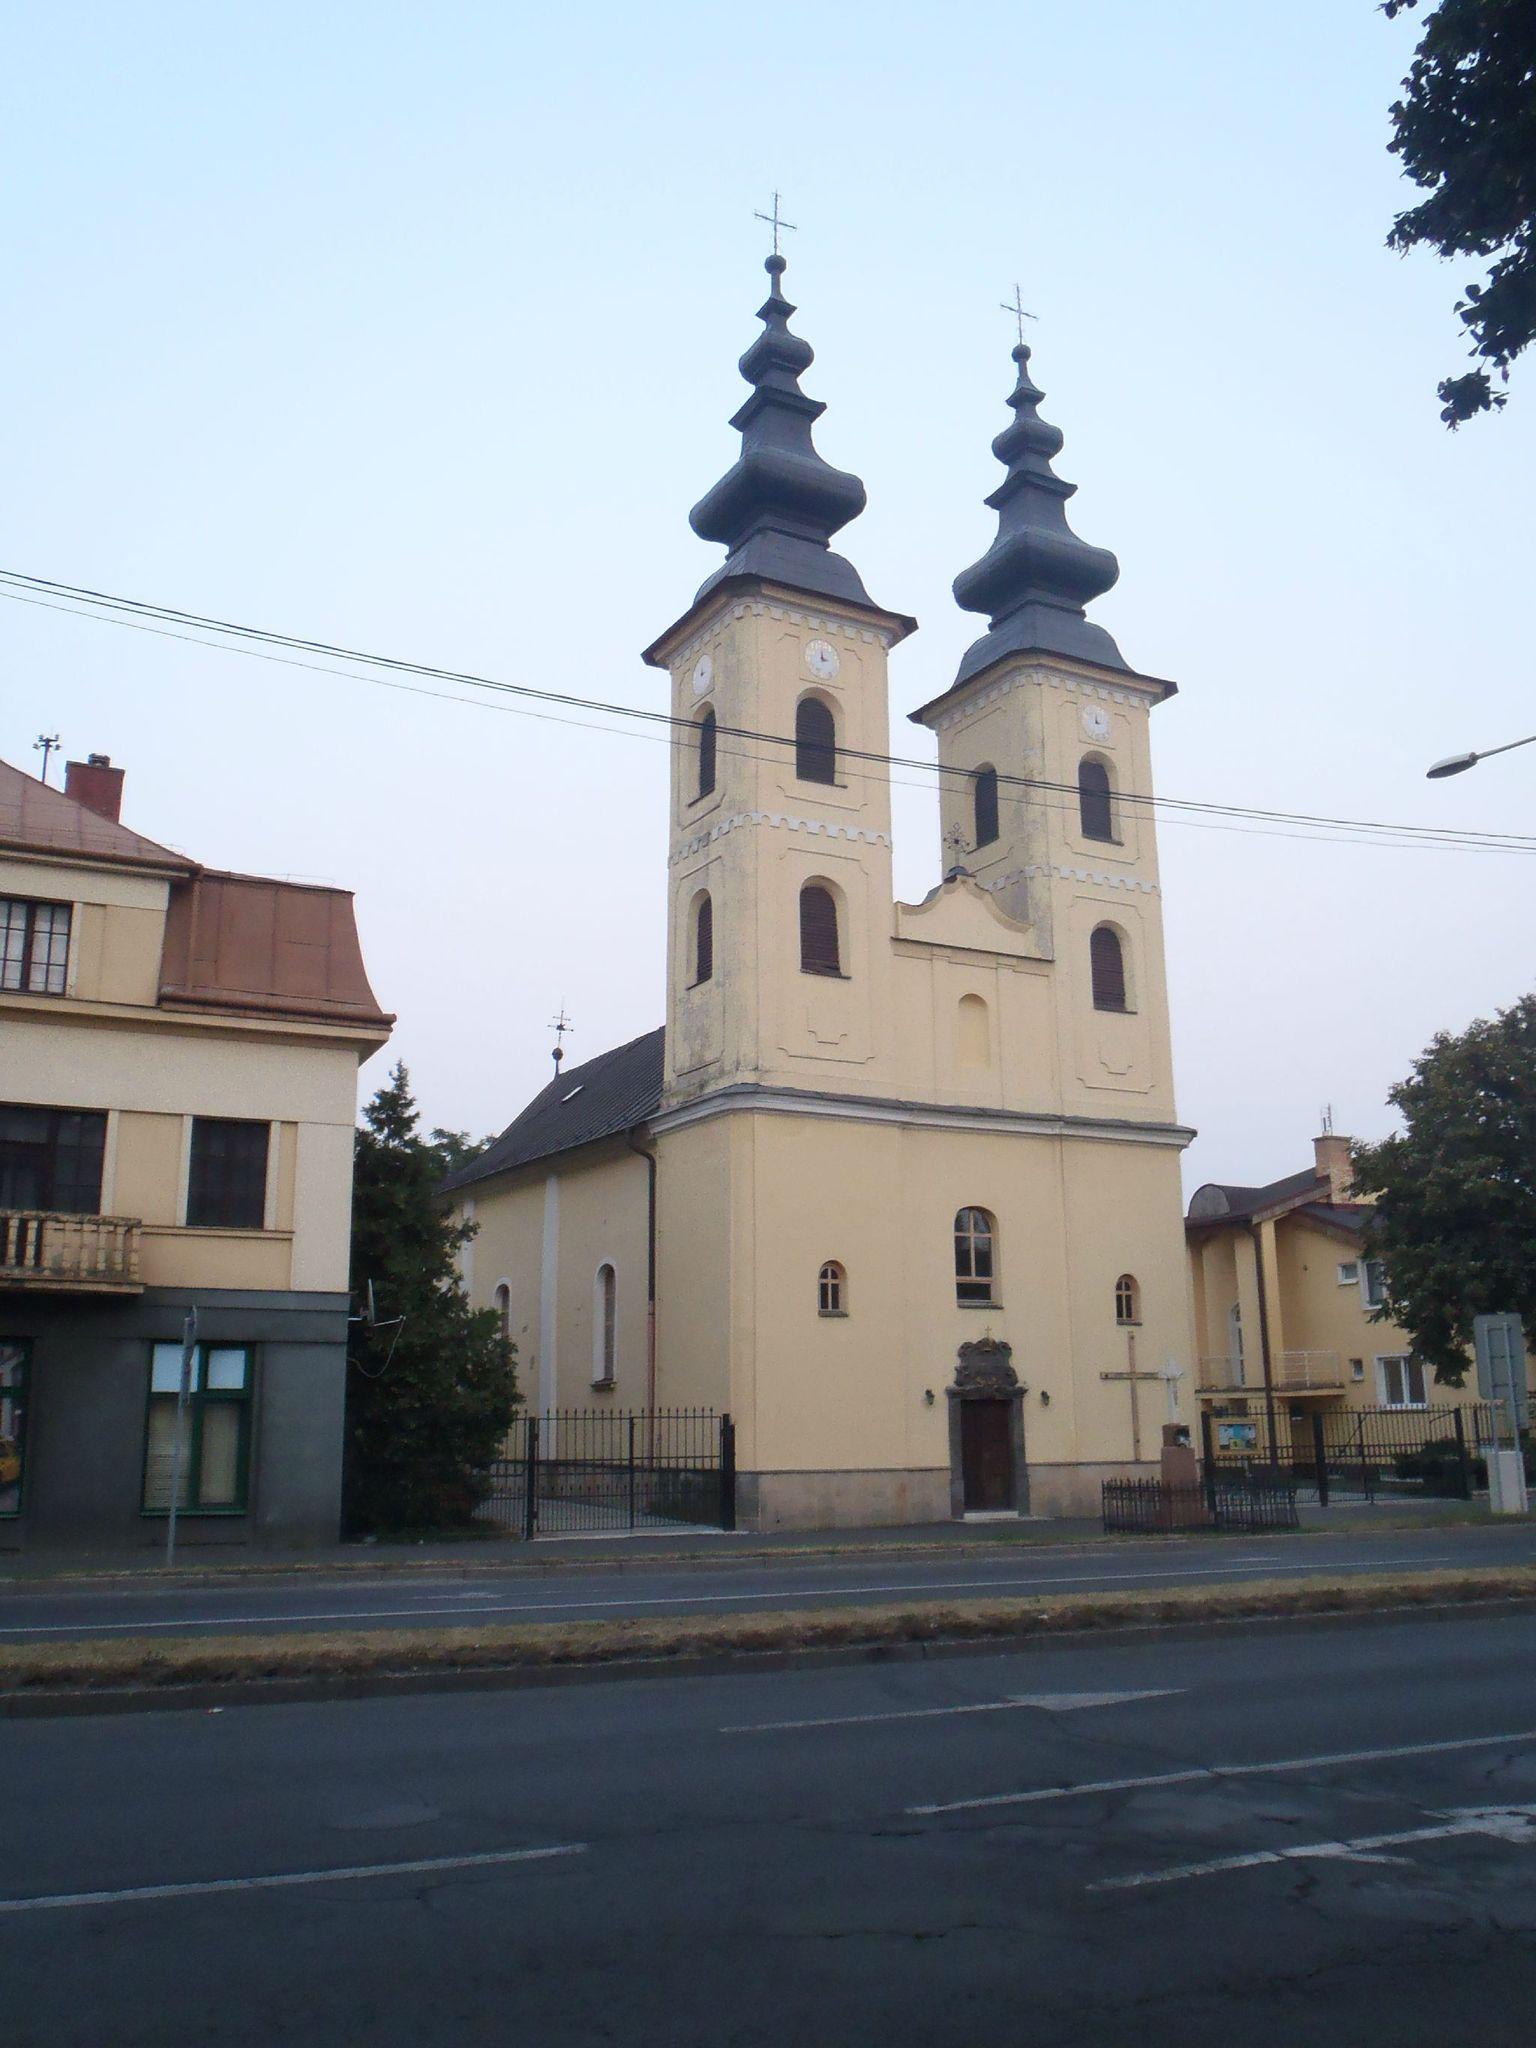 hongrie - lieu de culte